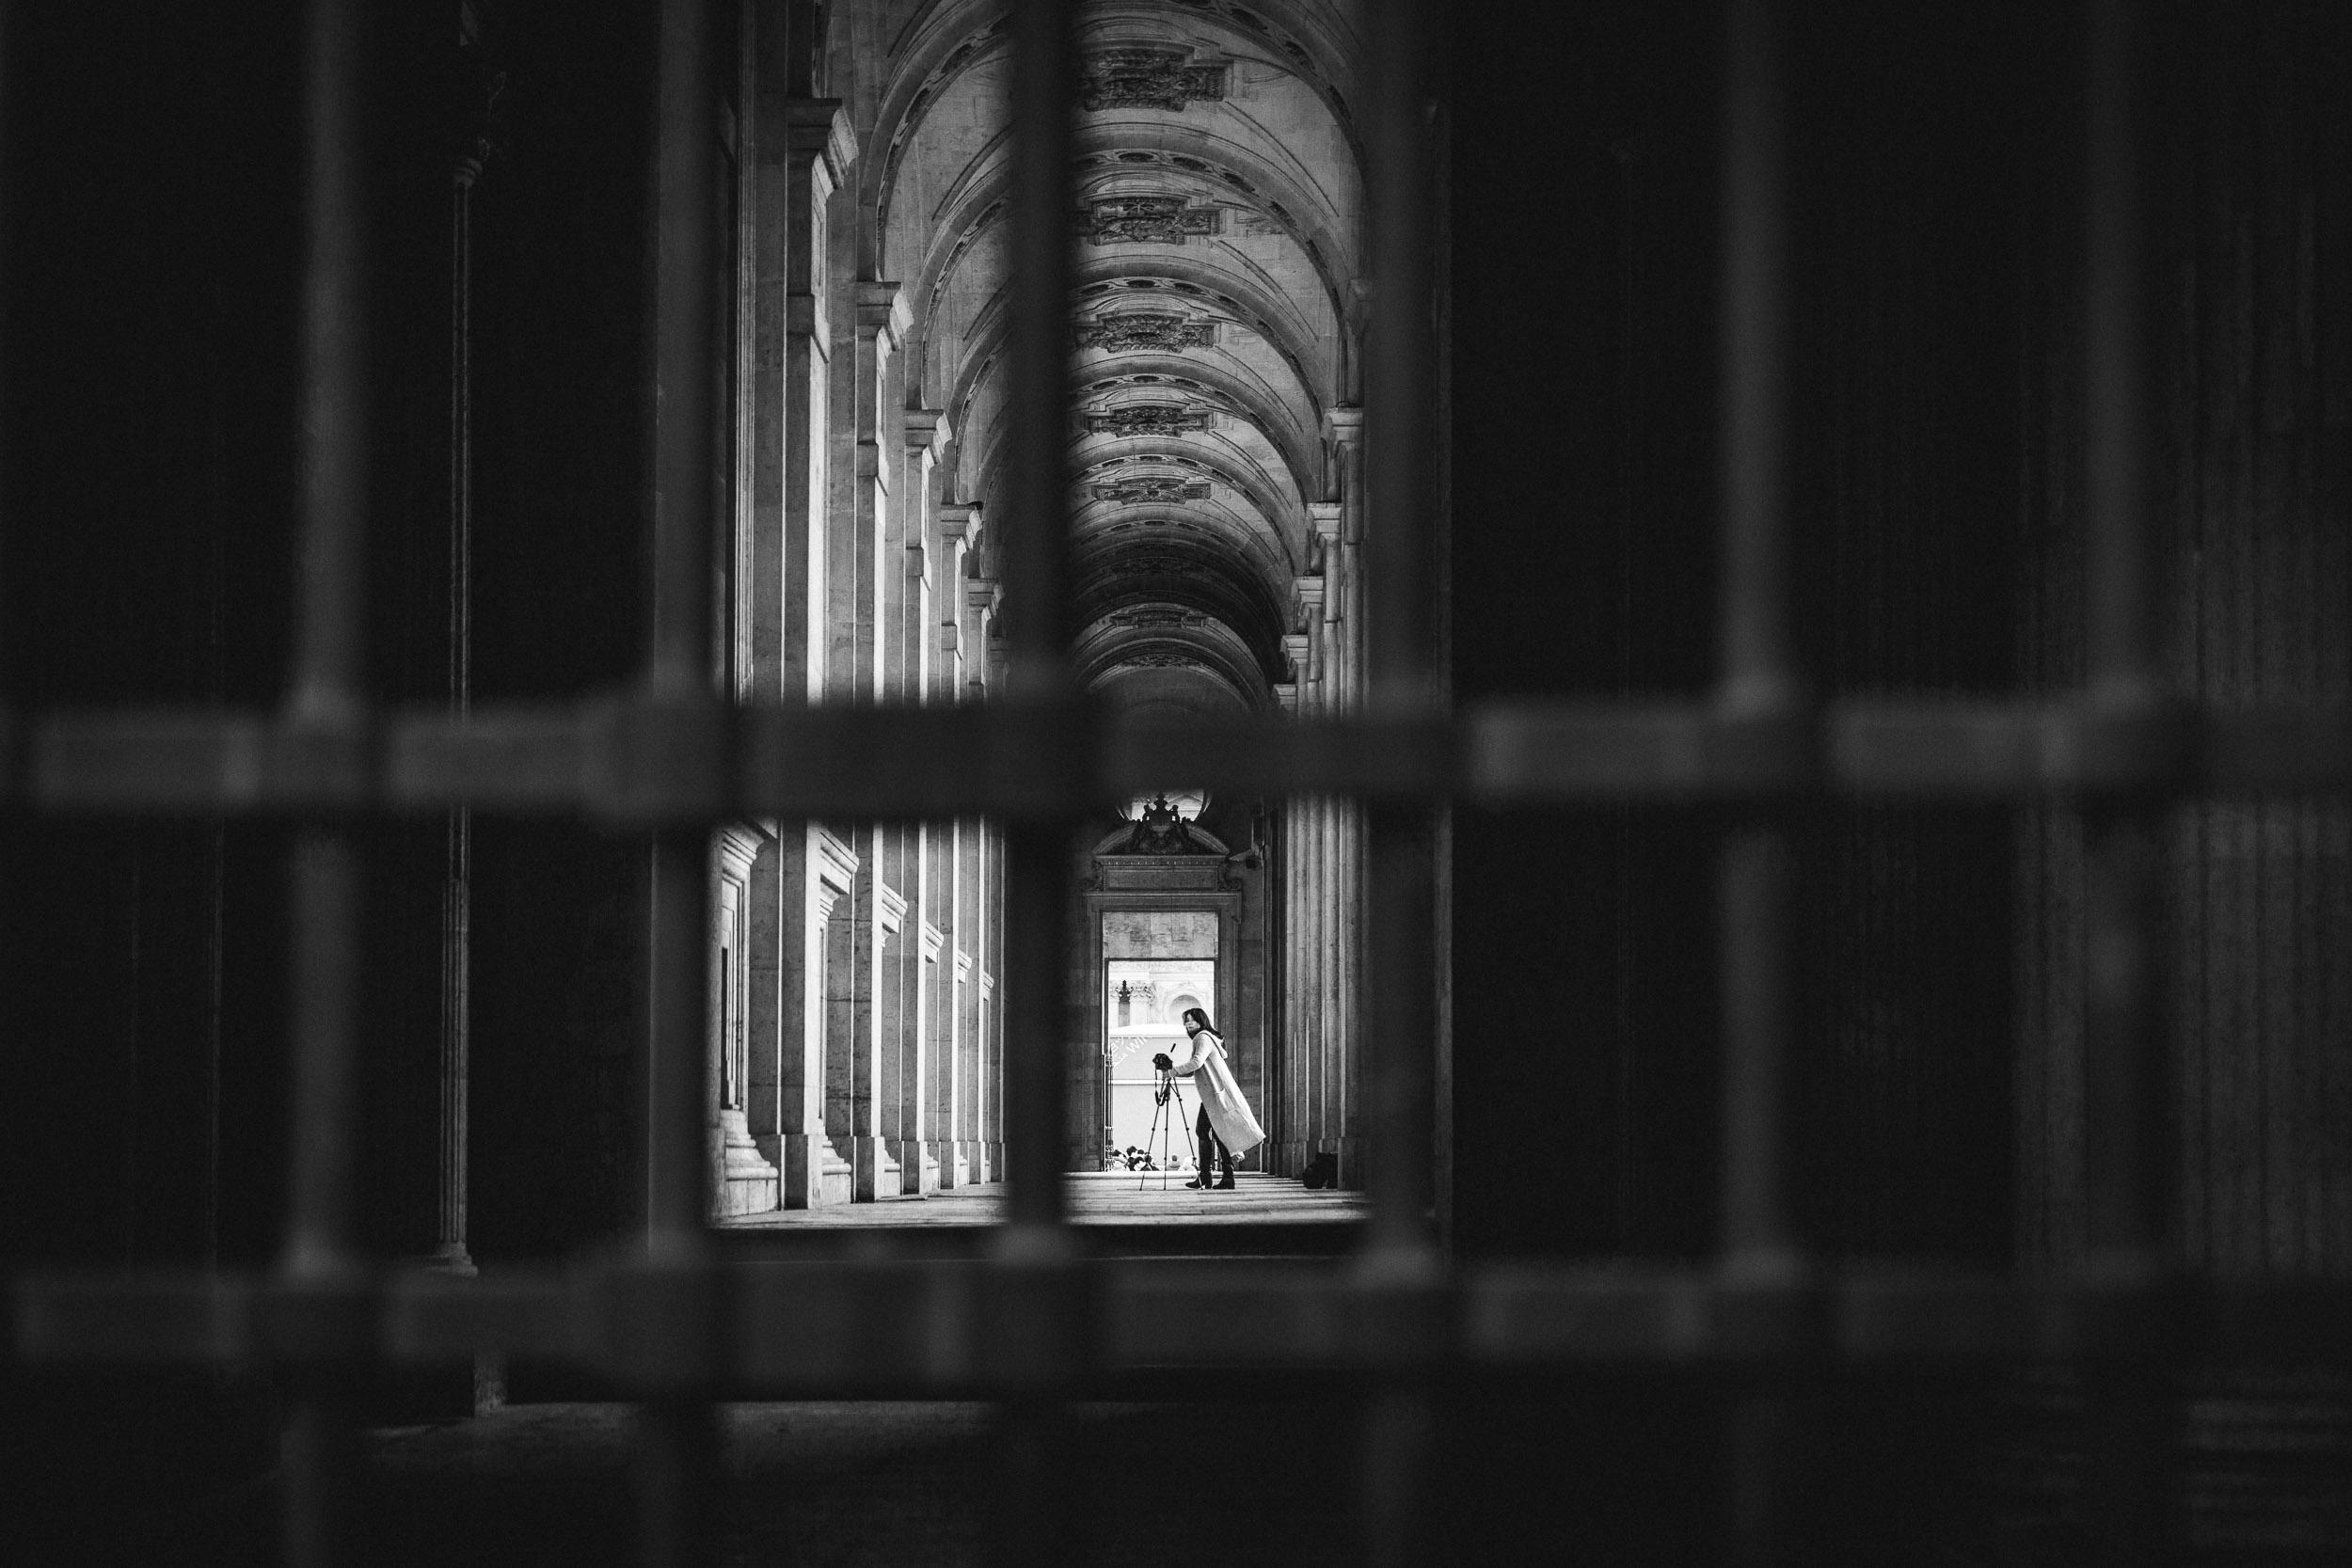 Paris-Louvre-Photographing-Photographer.jpg